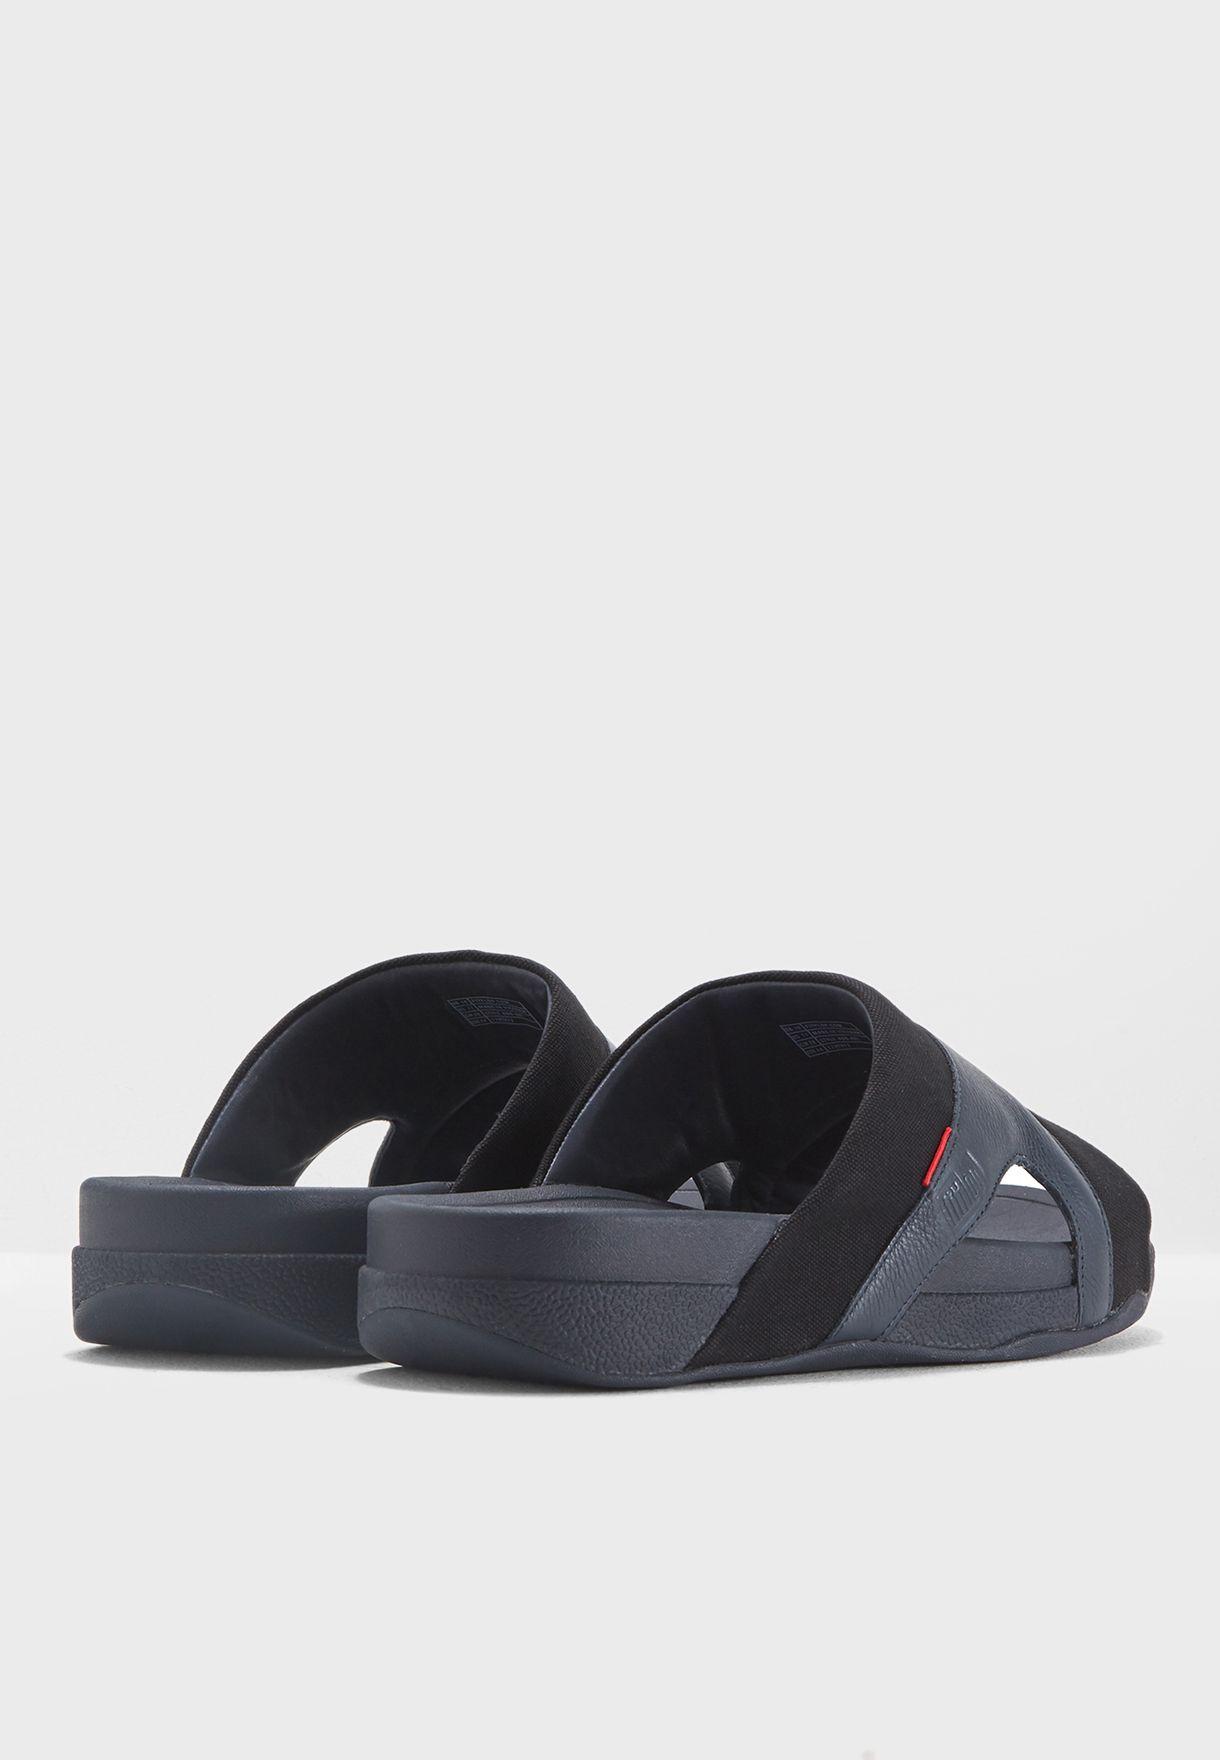 8503c811a505e6 Shop Fitflop navy Freeway Pool Slide Sandals K98-401 for Men in UAE ...